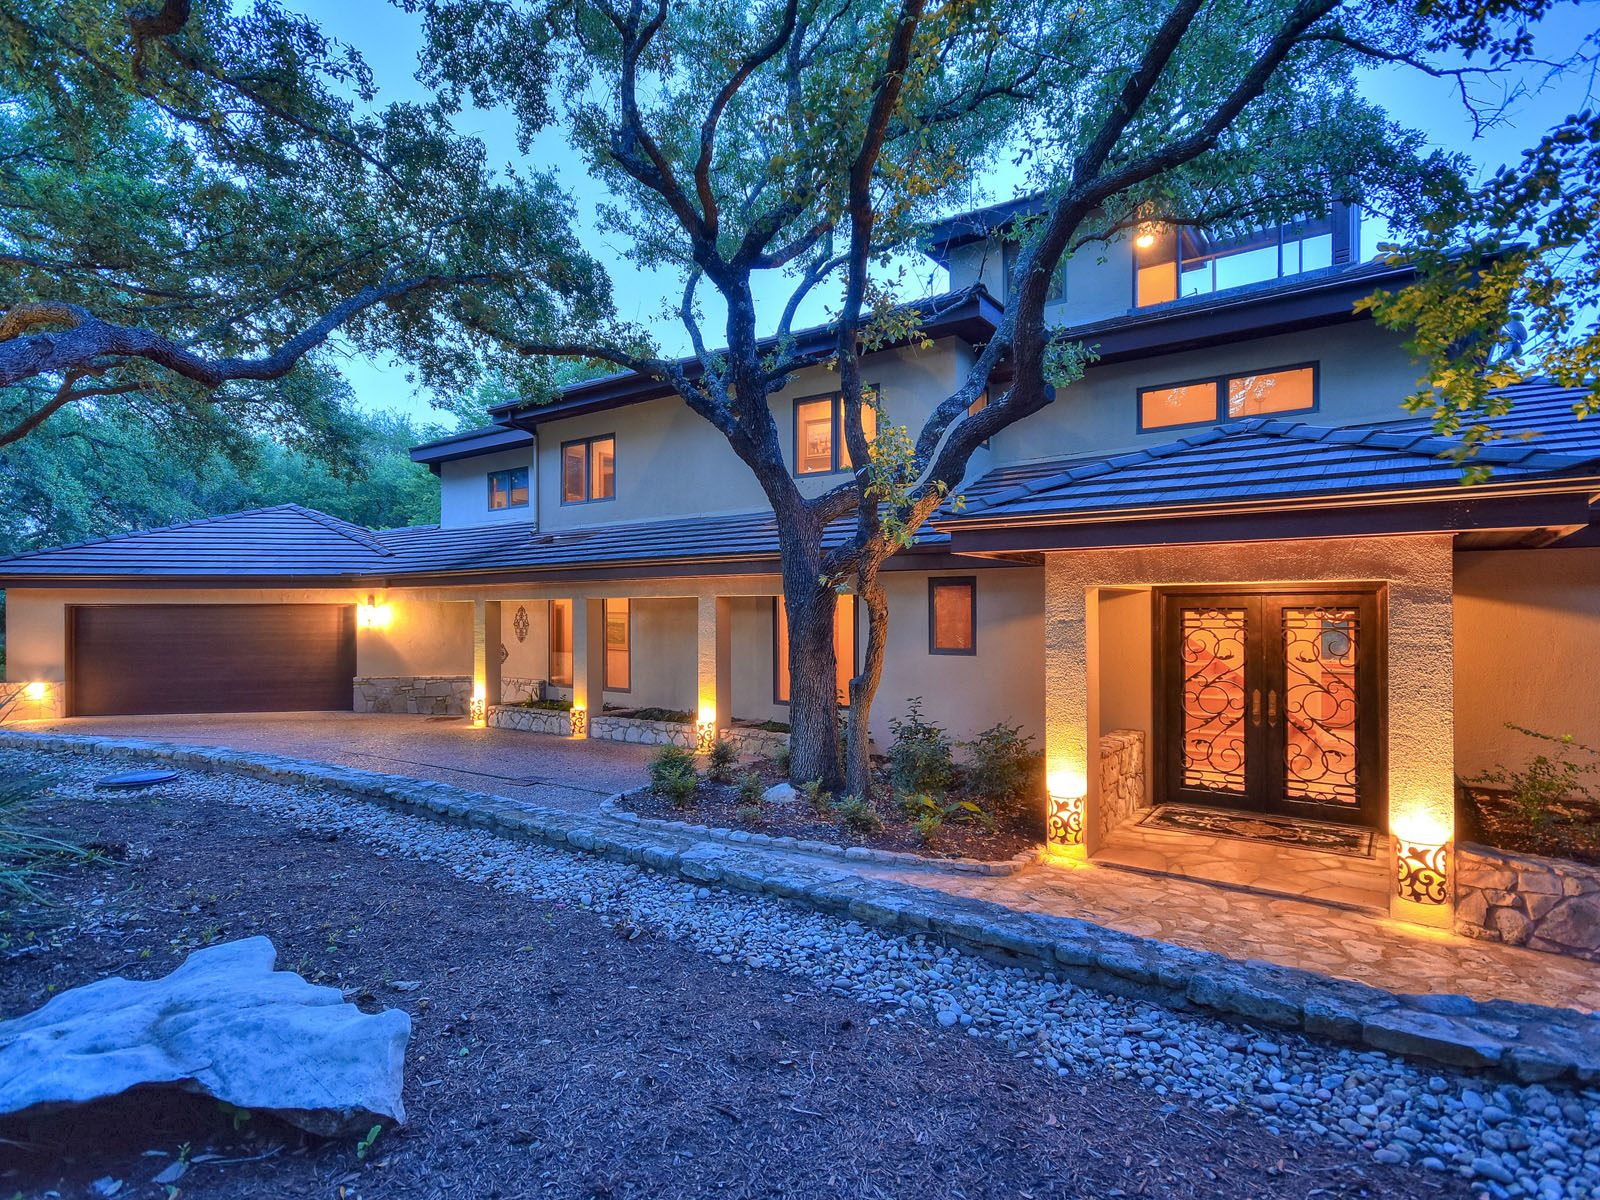 Casa Unifamiliar por un Venta en The Ideal Retreat 2703 Sailboat Pass Spicewood, Texas 78669 Estados Unidos